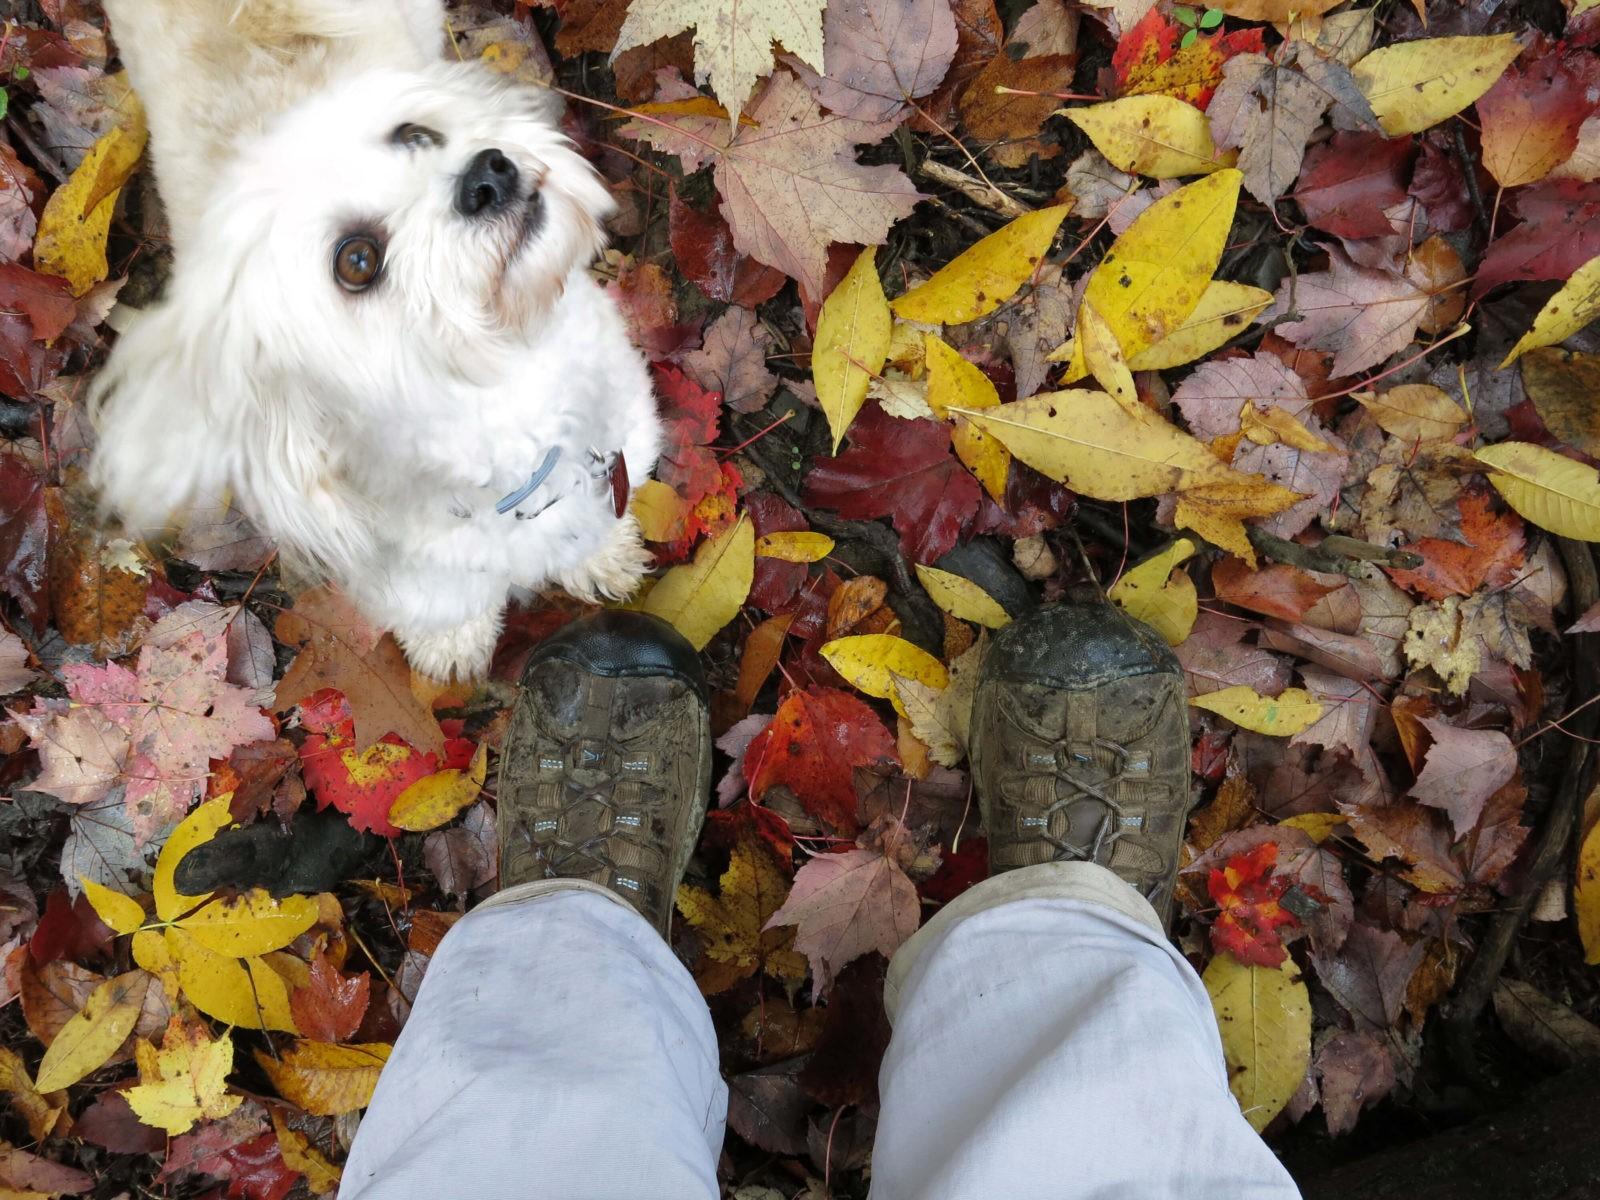 Suki, Robin Botie's Havanese dog, looks up as Robin photographs the fallen leaves at their feet